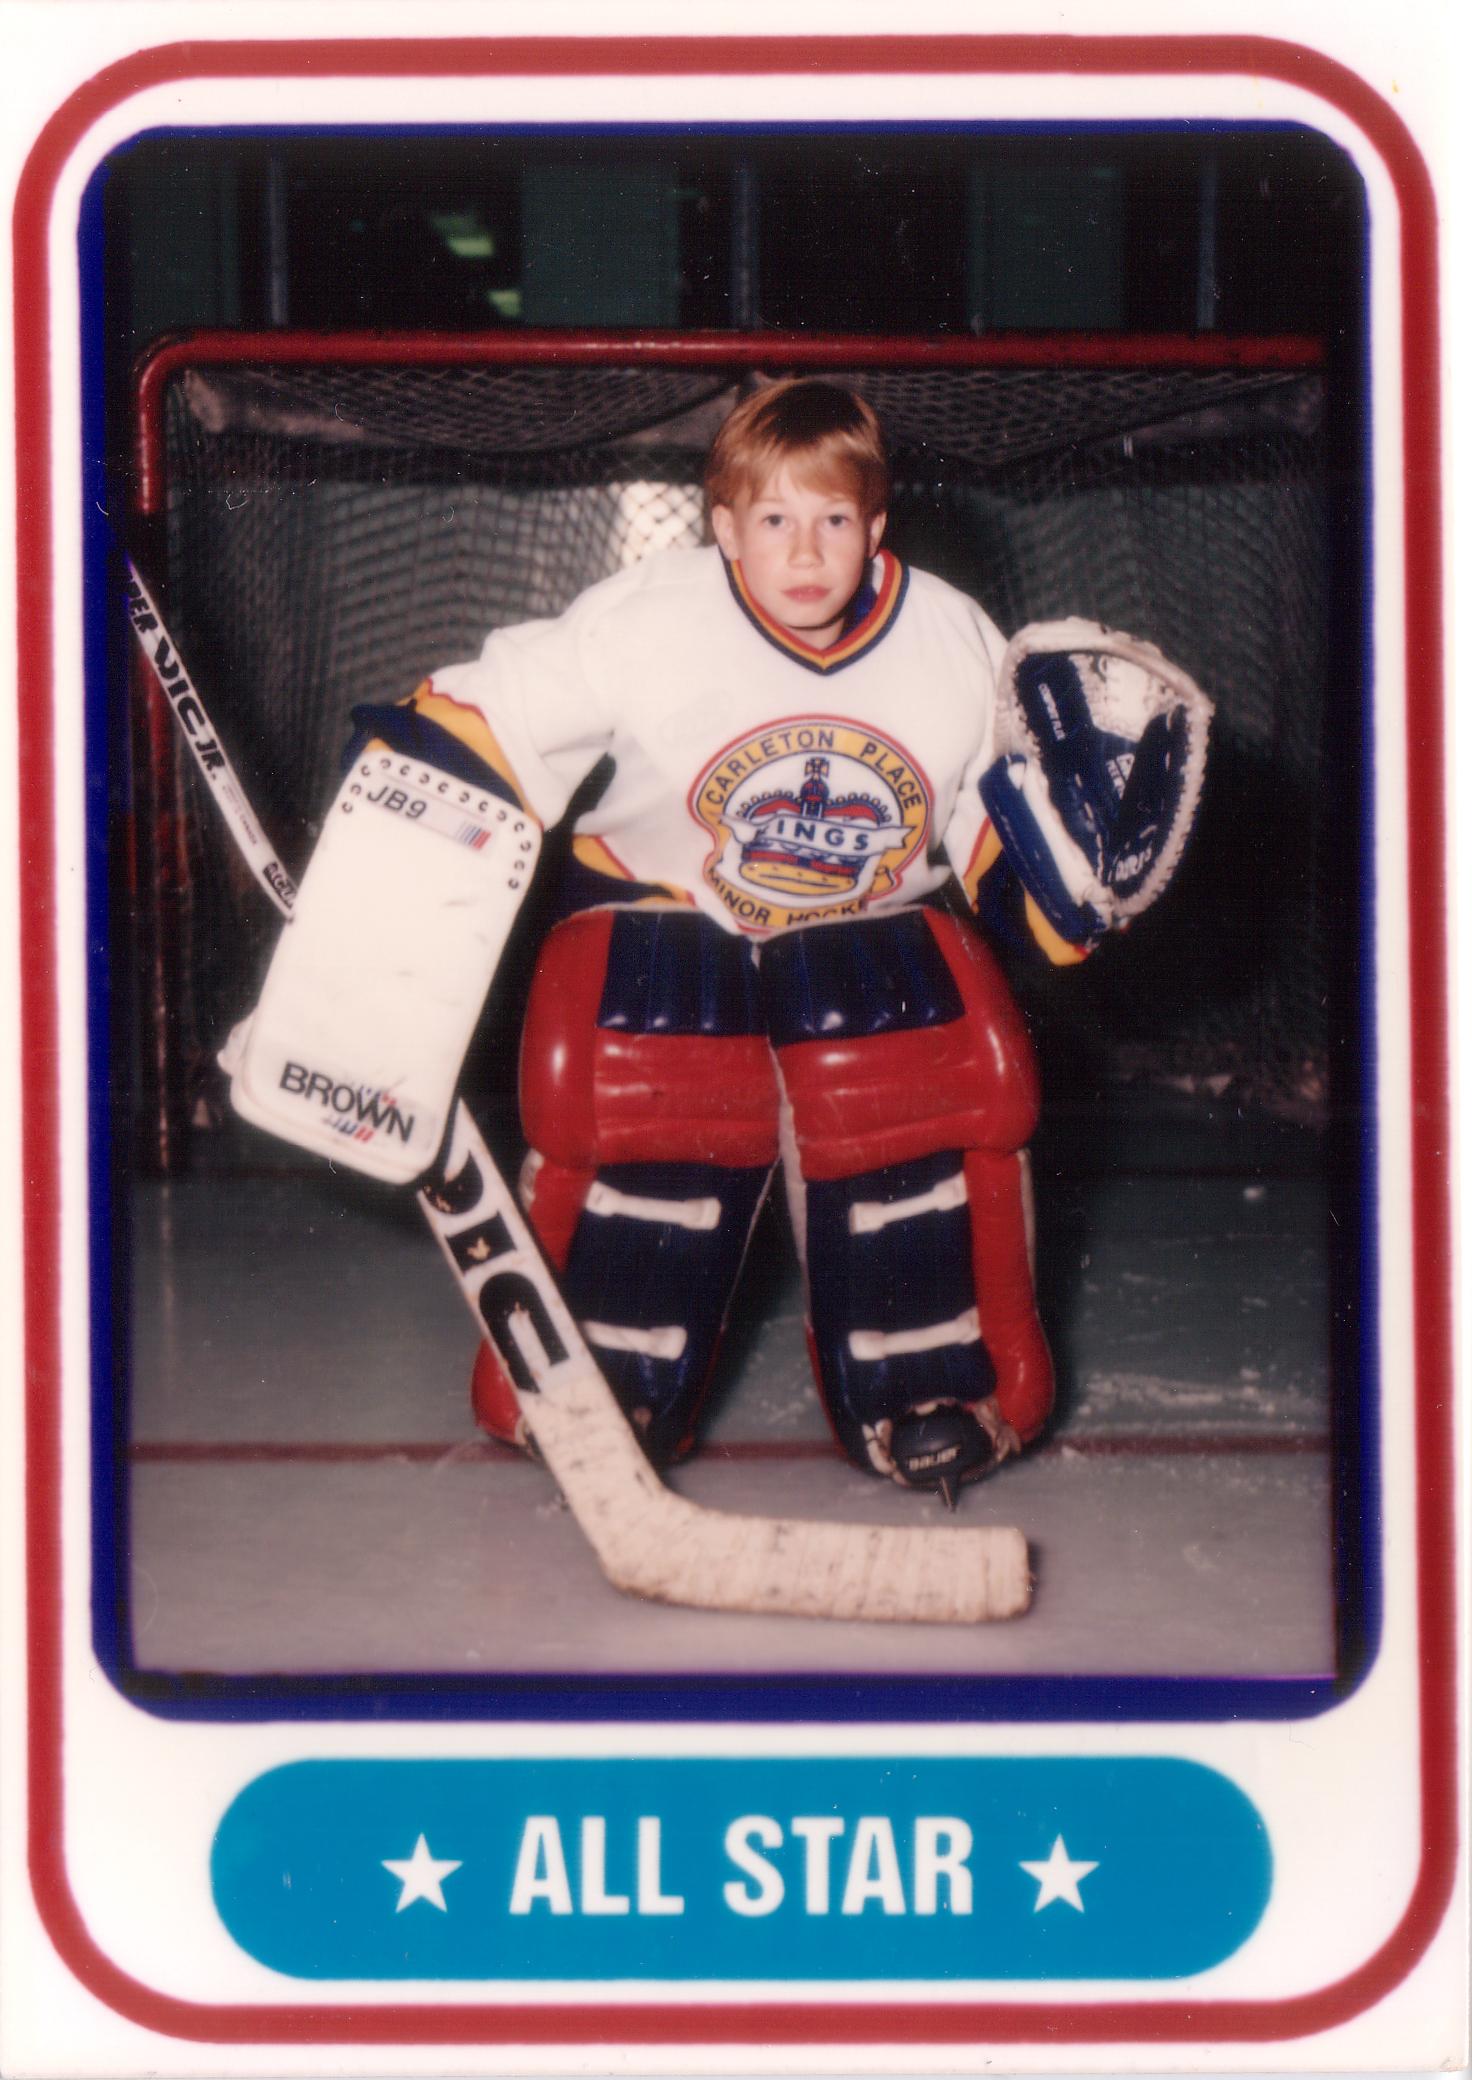 Steve Cameron. Goalie, 1991-92 Carelton Place Kings